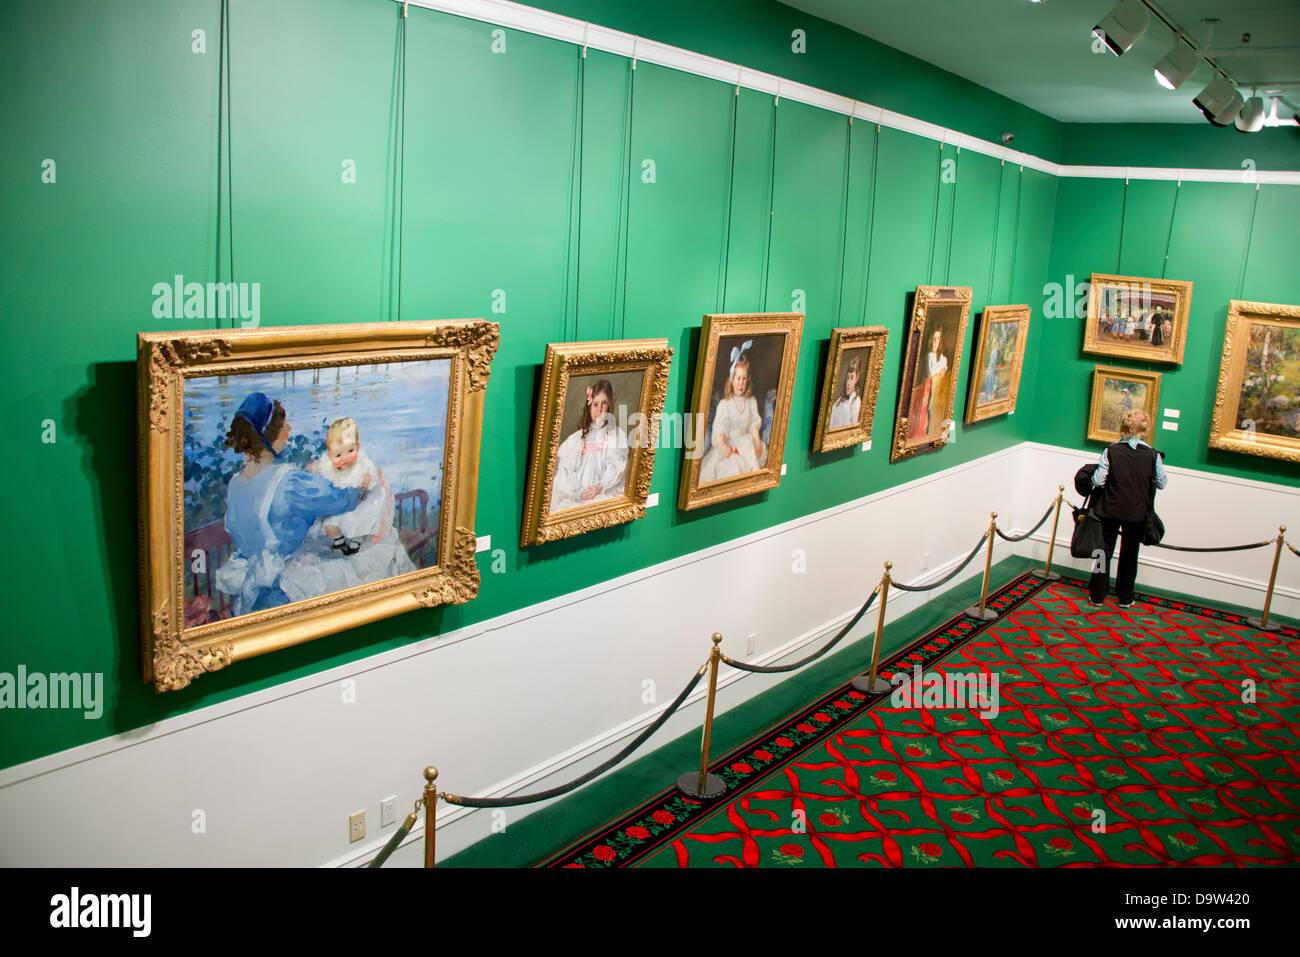 Michigan, Mackinac Island. American impressionist portrait art collection inside the historic landmark Grand Hotel, - Stock Image